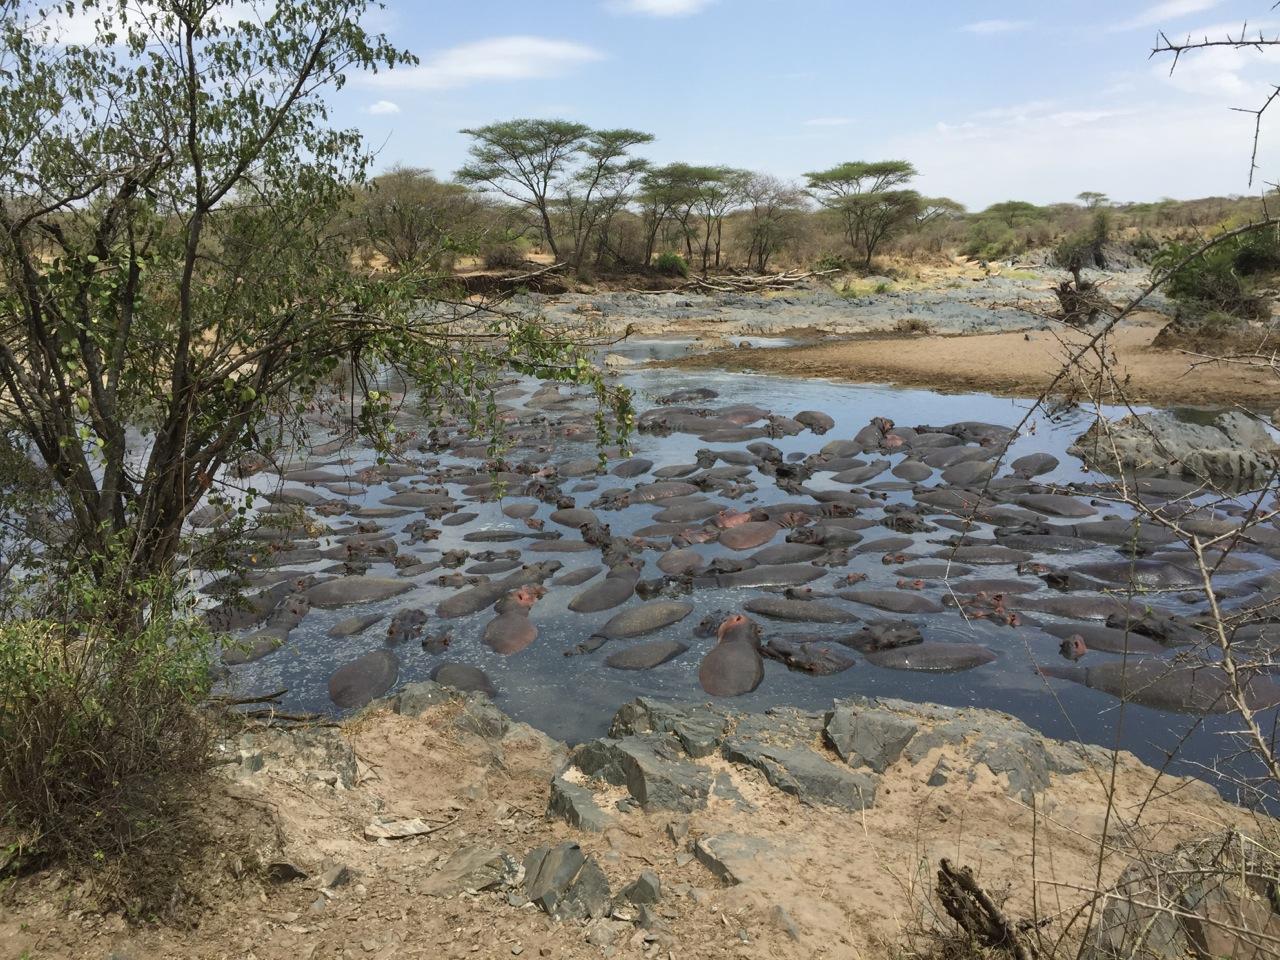 Hippos wallowing in a lagoon near the Tanangire National Park, Tanzania.